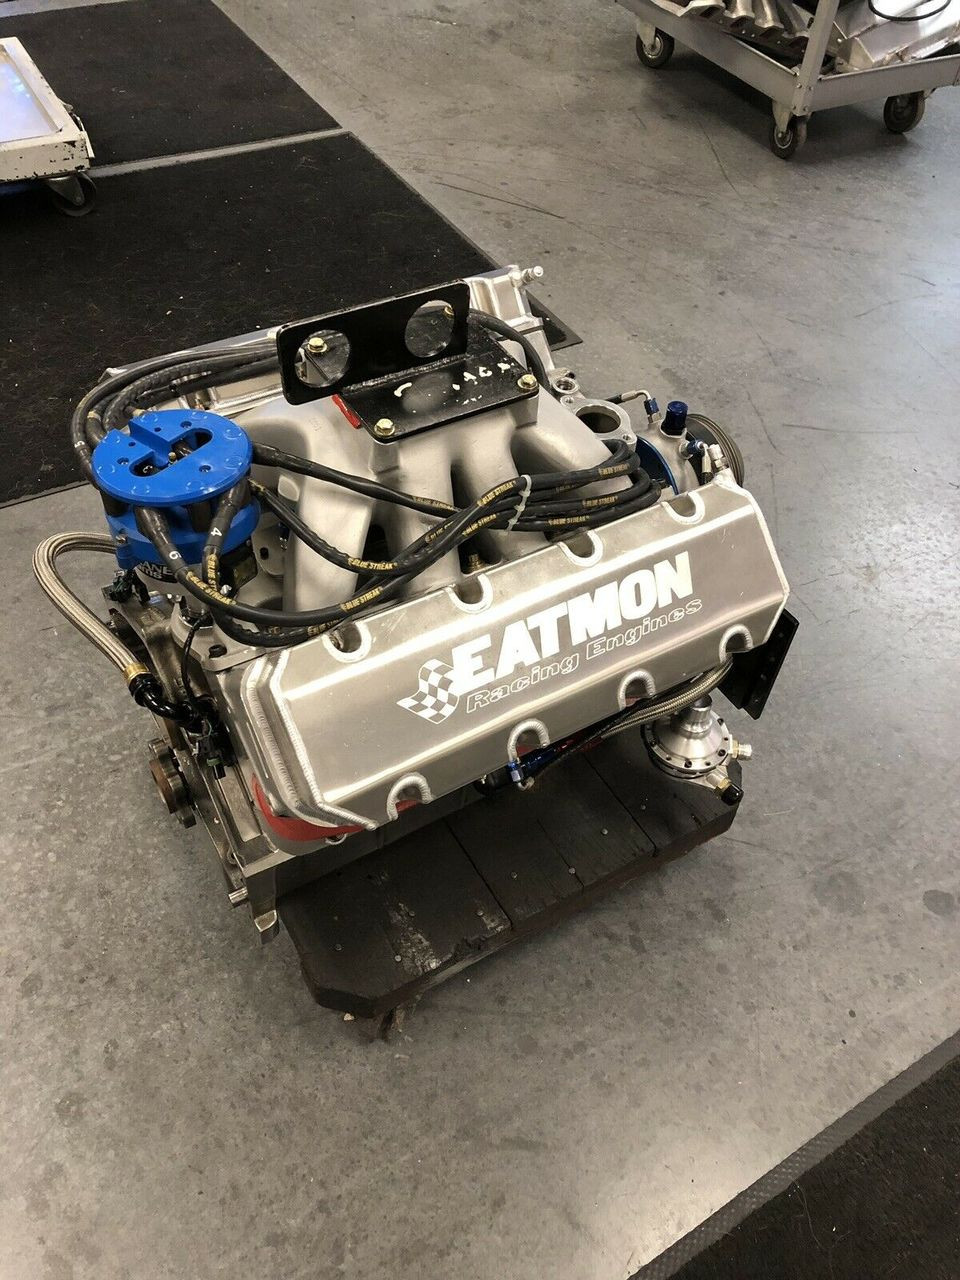 FRESH BUILT NASCAR CHEVY SB2 2 COMPLETE RACE ENGINE 359cid 844 HP 550 ft-lb